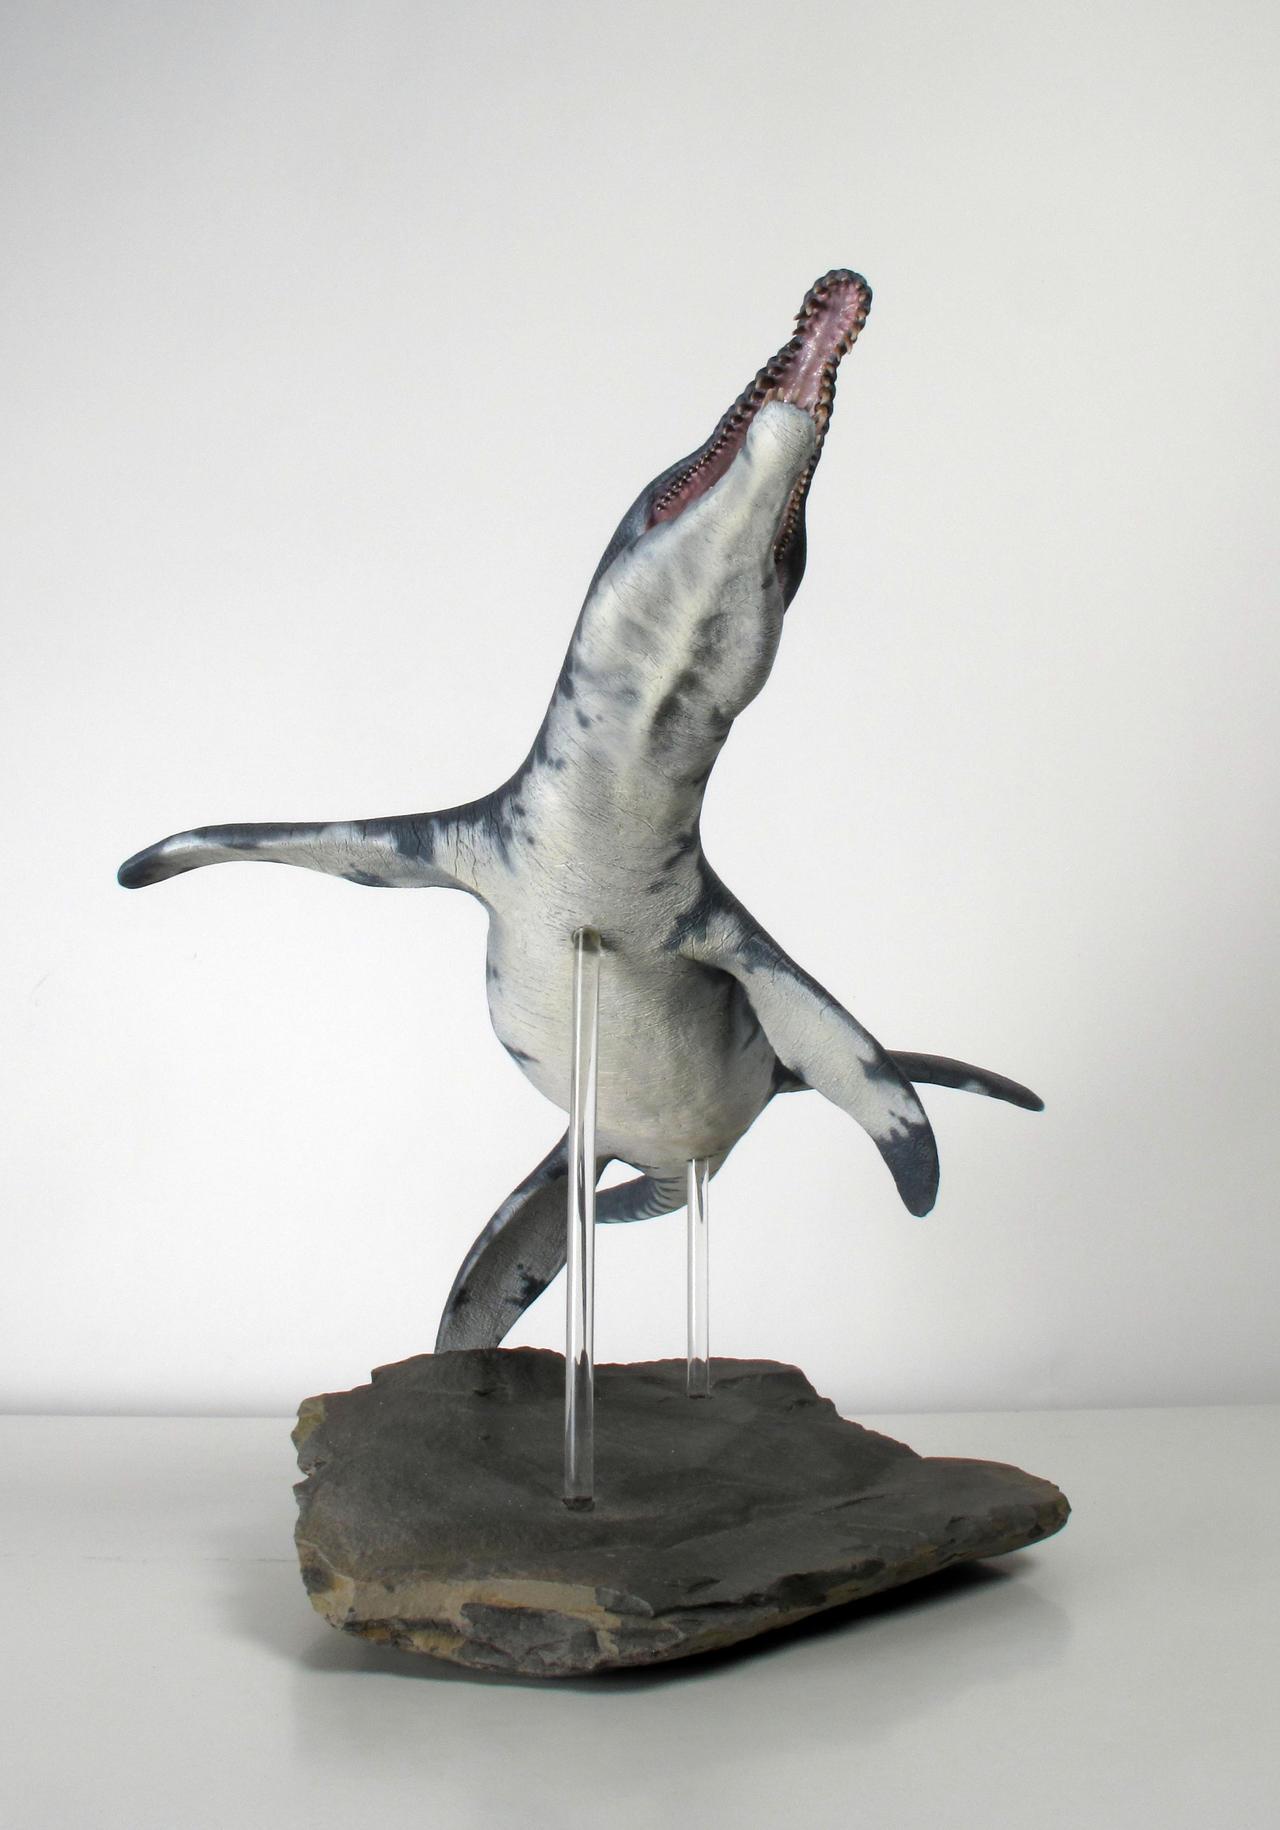 Pliosaurus macromerus 4 by Thomasotom